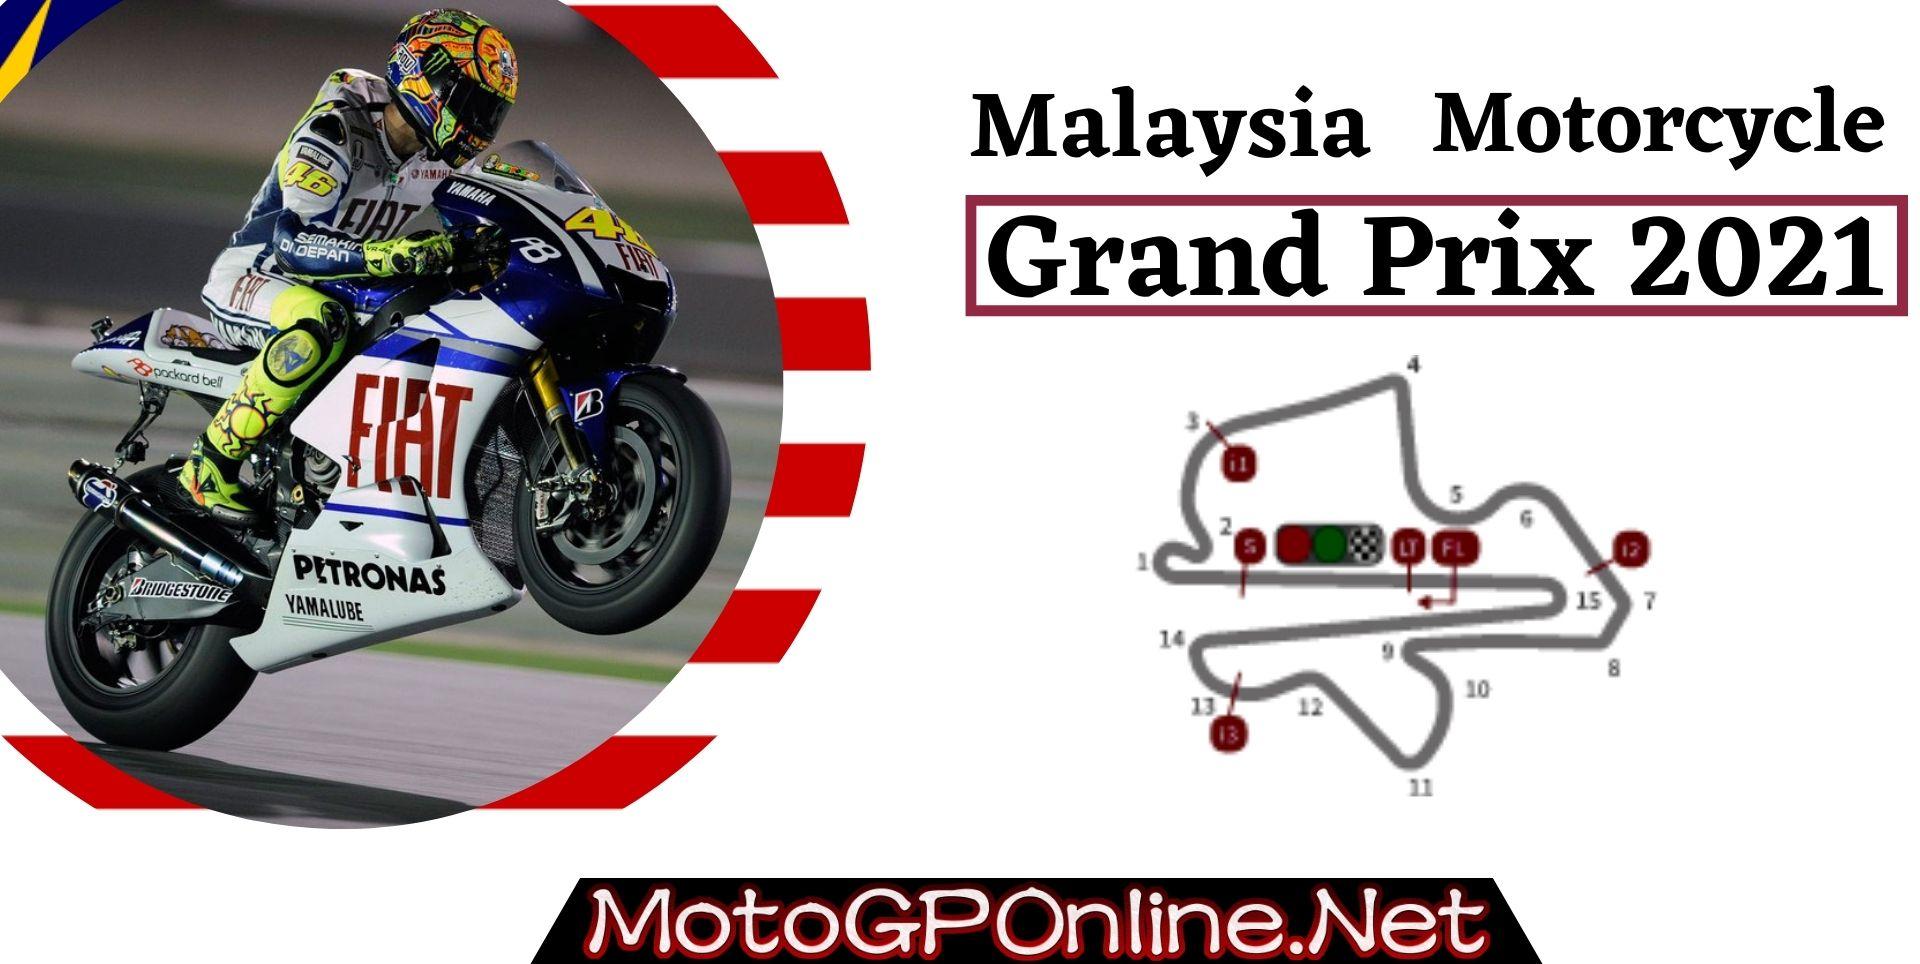 Malaysia Grand Prix Live Stream MotoGP 2021 | Full Race Replay